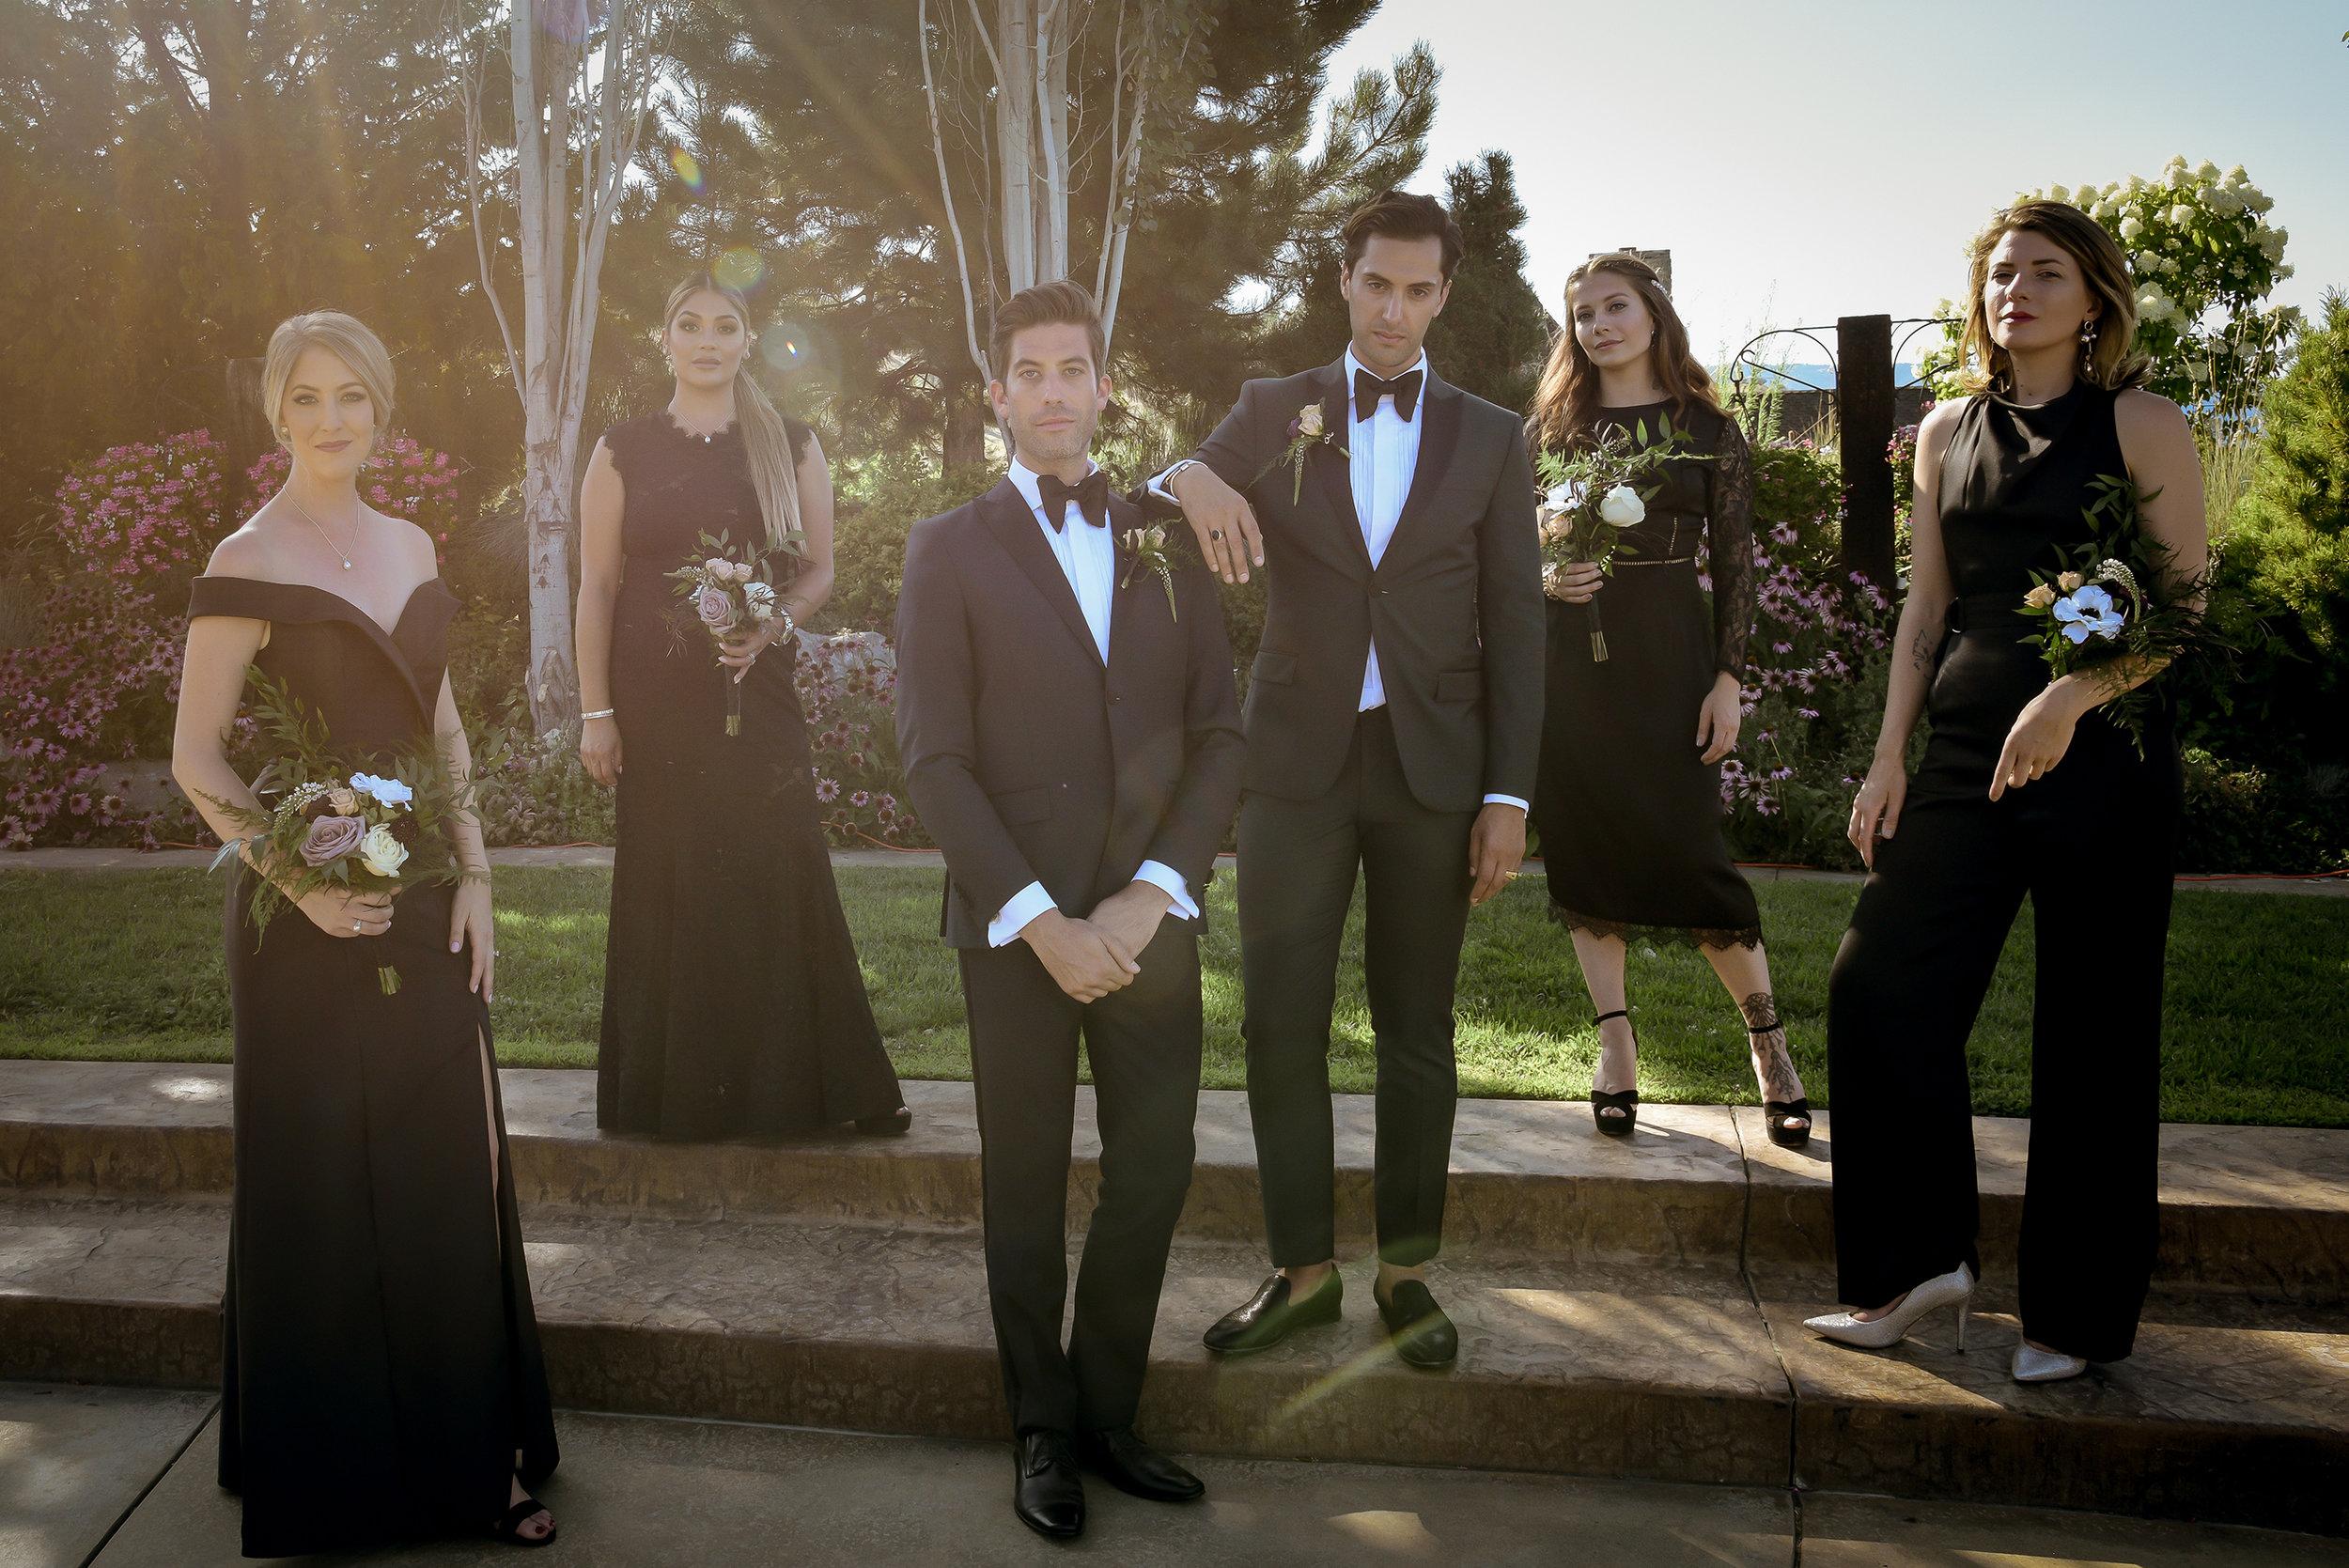 Austin&Dorian-Wedding-1183.JPG